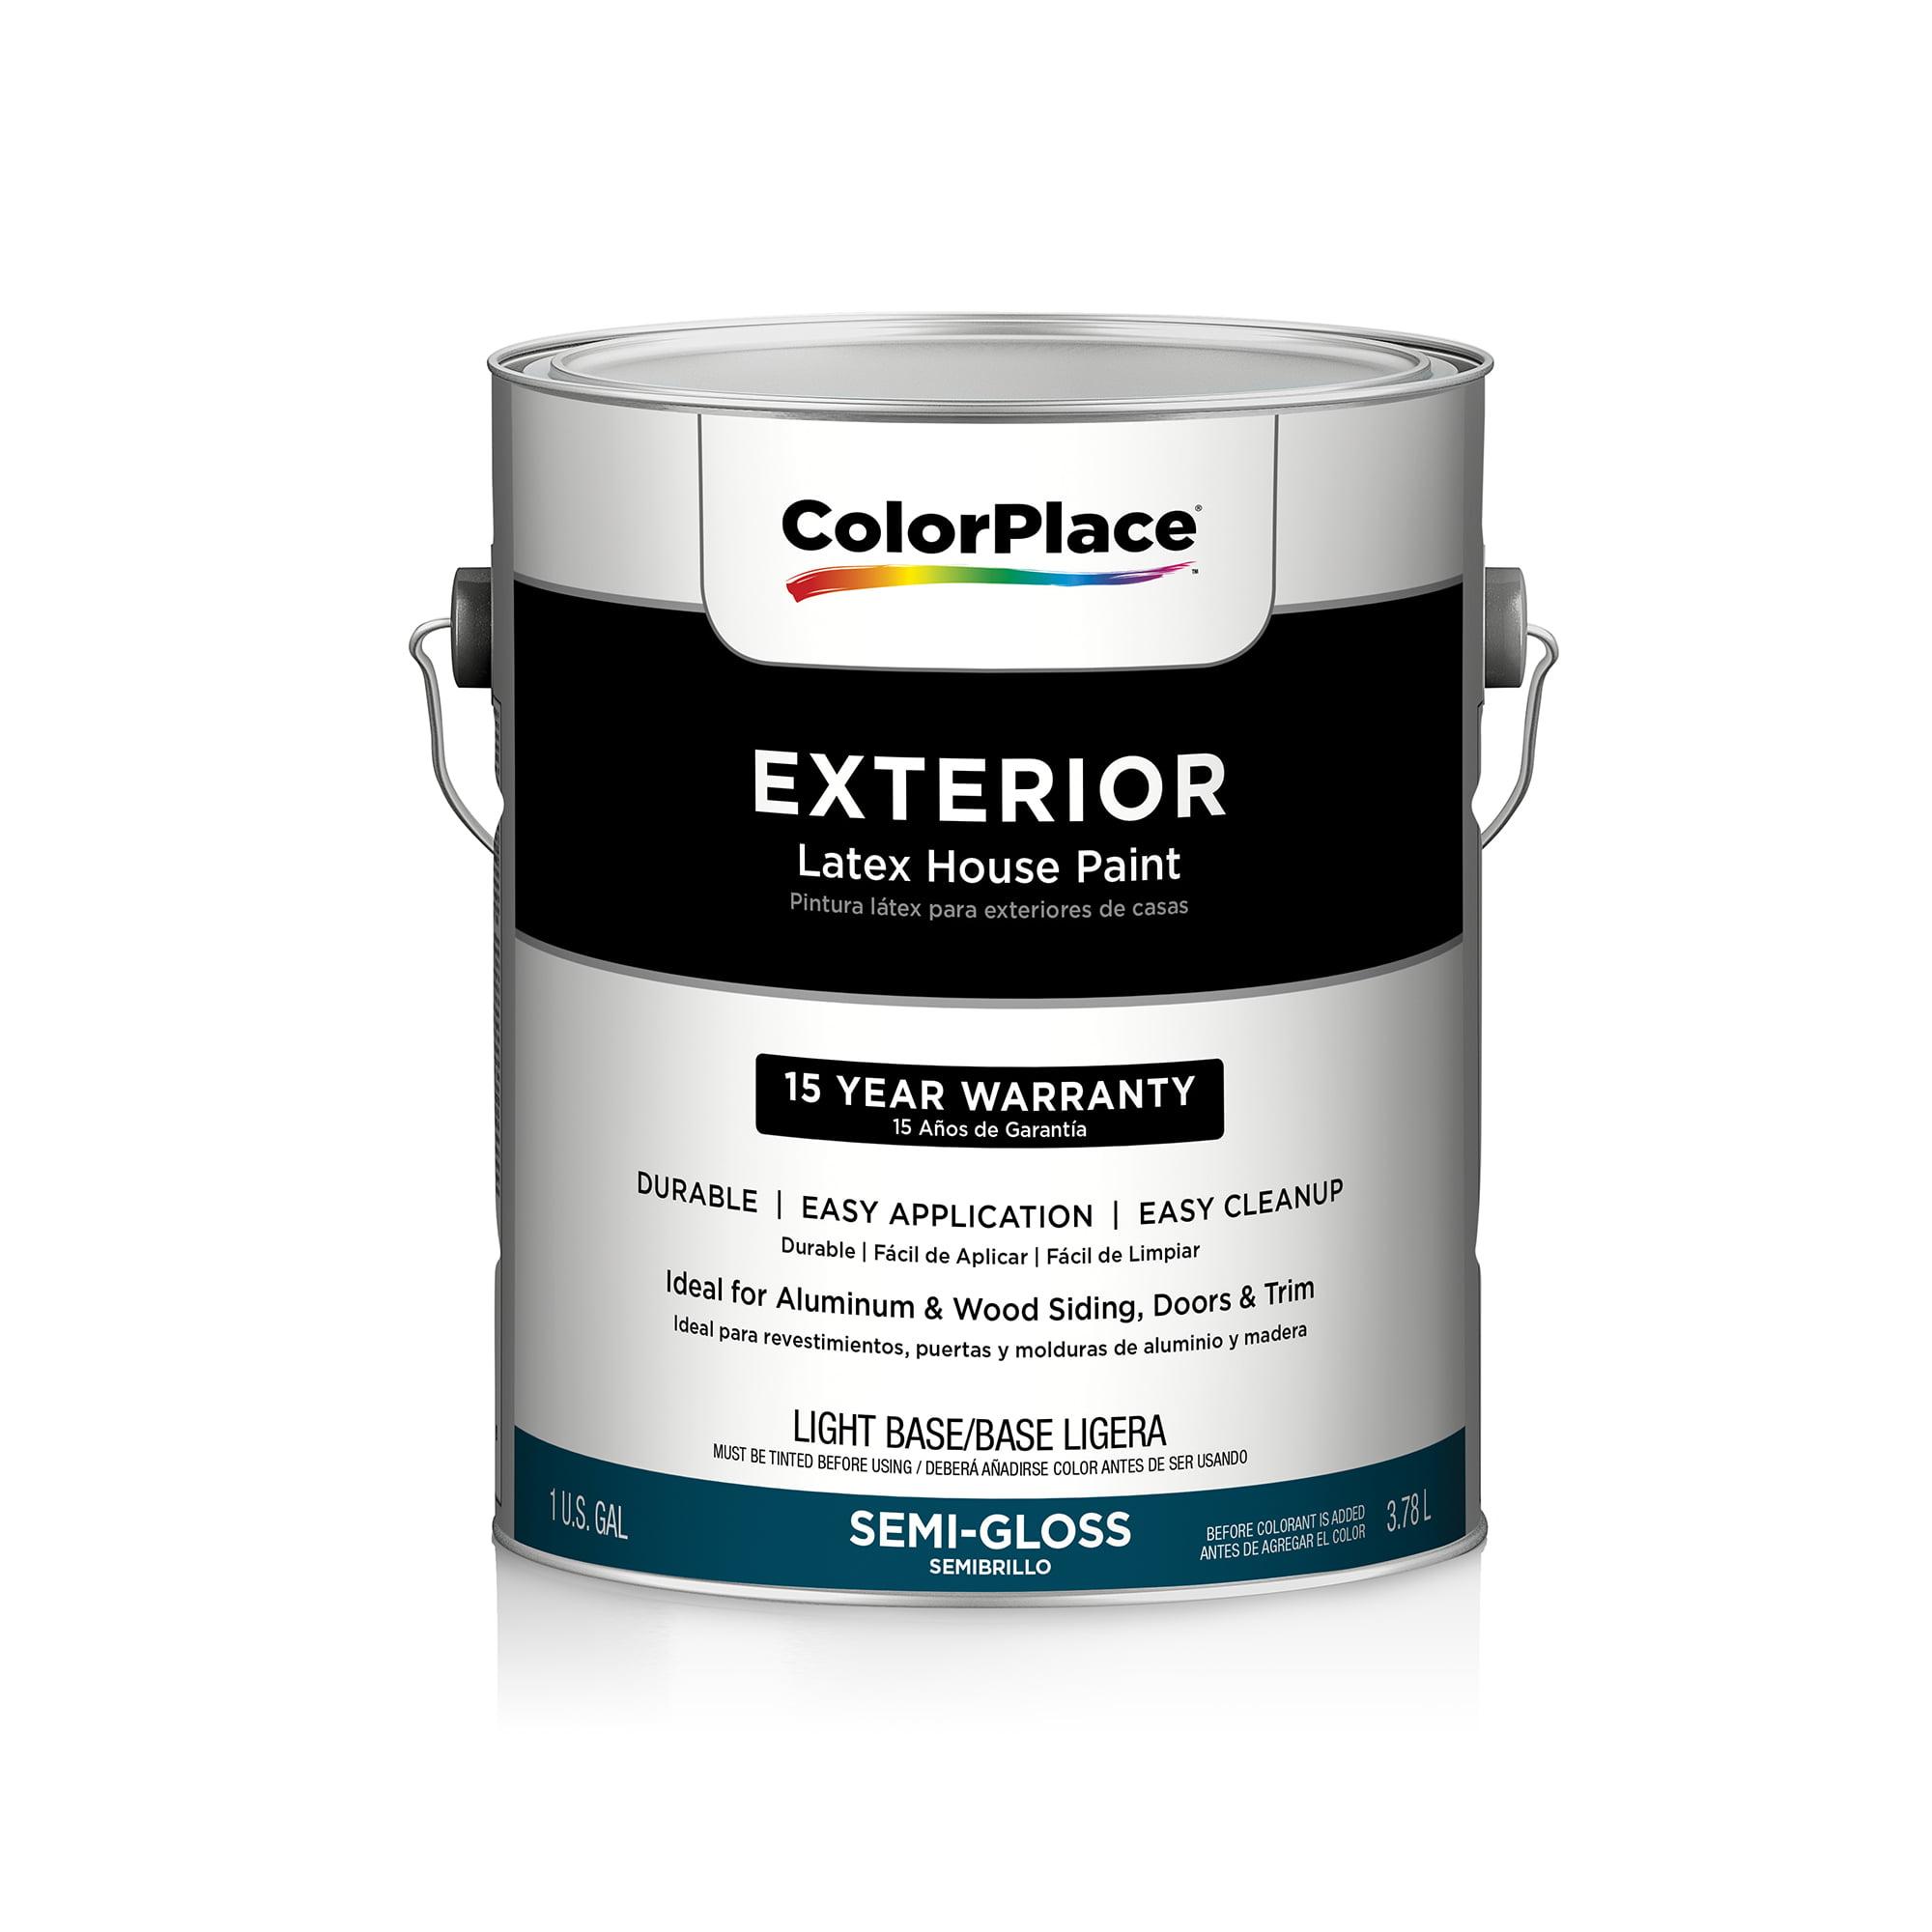 Color Place Exterior Semi-Gloss Paint, Light Base